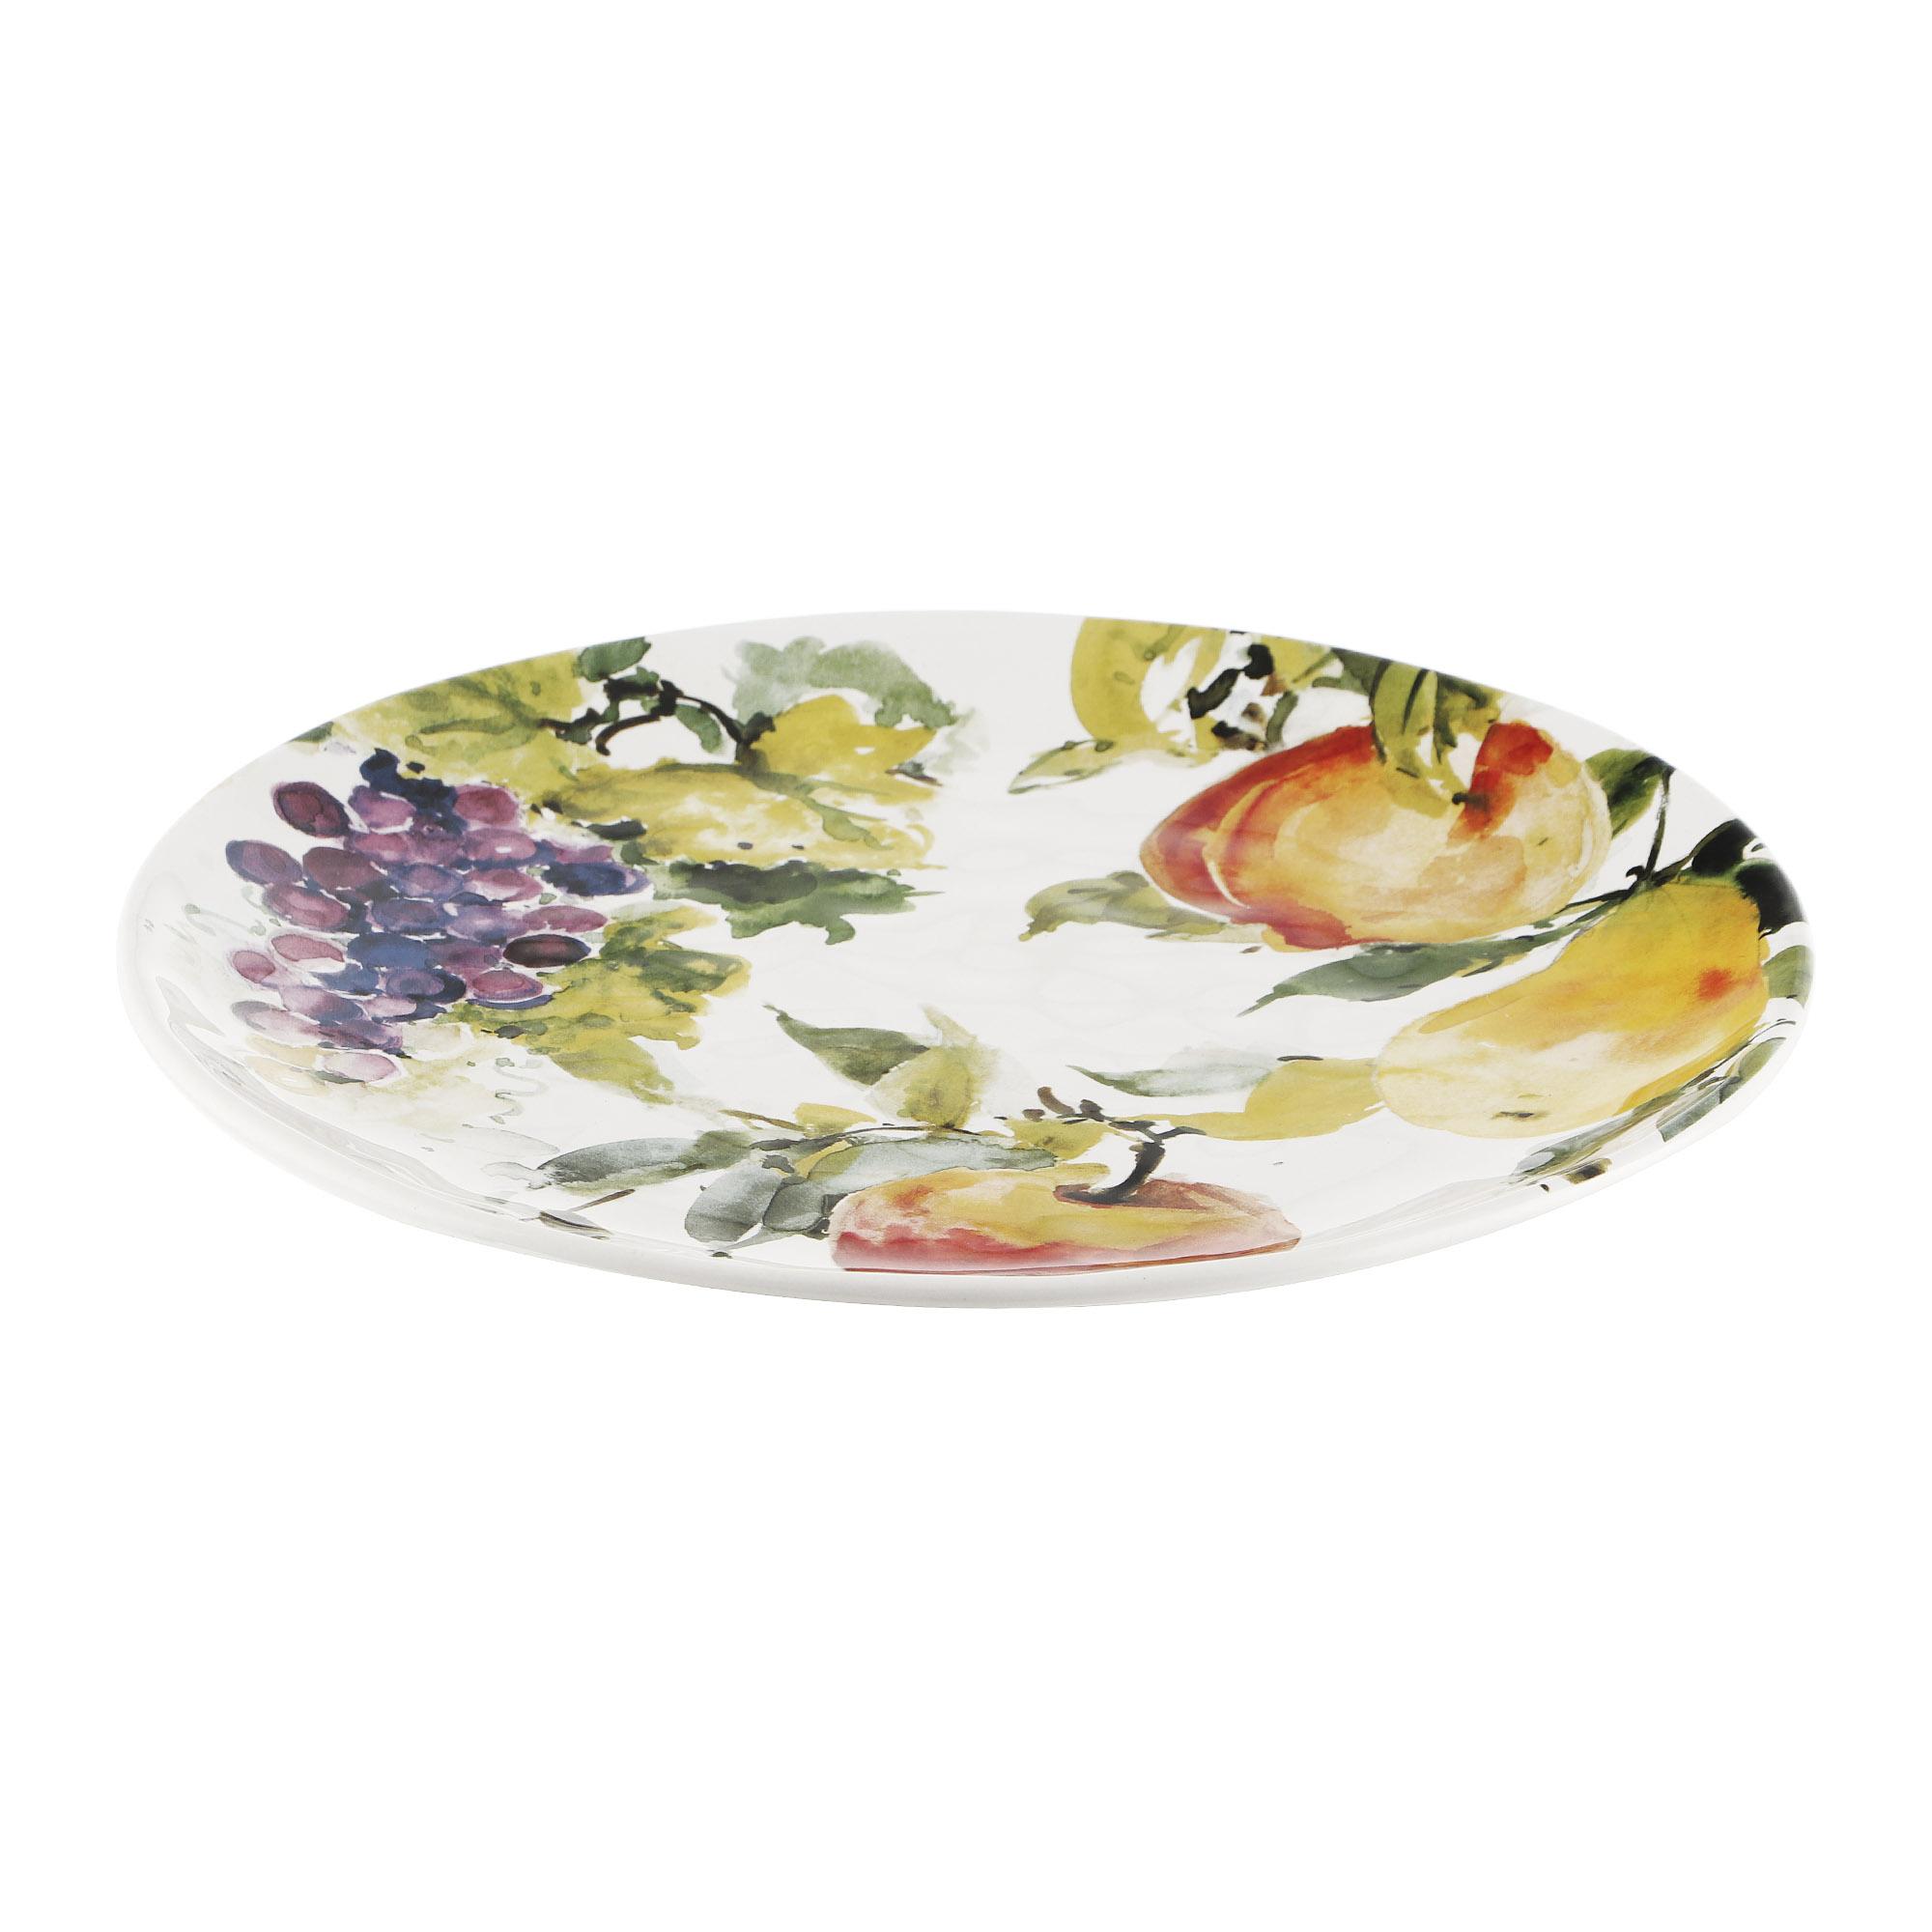 Тарелка обеденная Certified Int Амброзия 28 см тарелка обеденная зимний сад радость 28 см cer28315 1 certified international corp